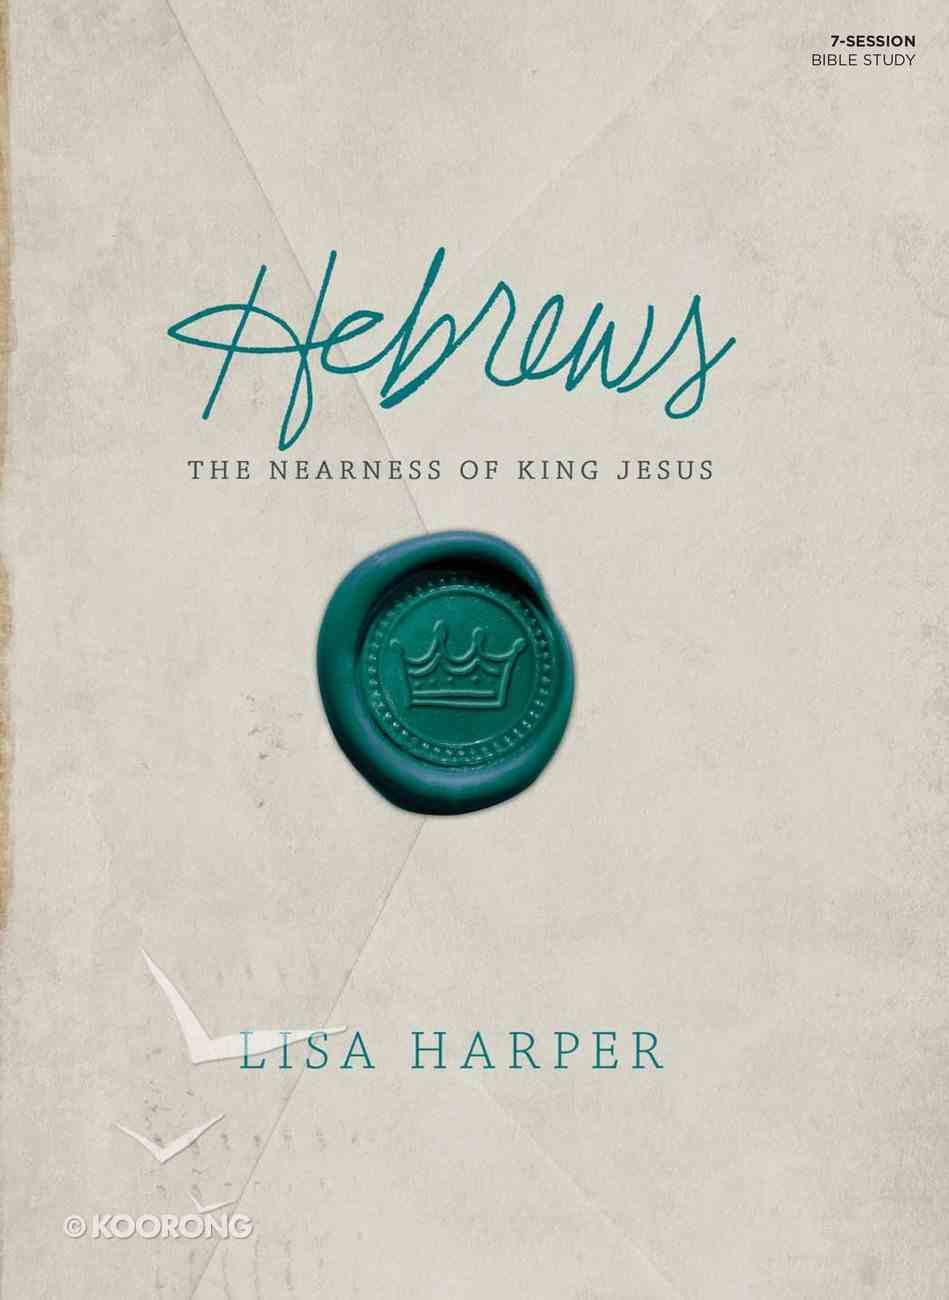 Hebrews: The Nearness of King Jesus (Member Book) Paperback